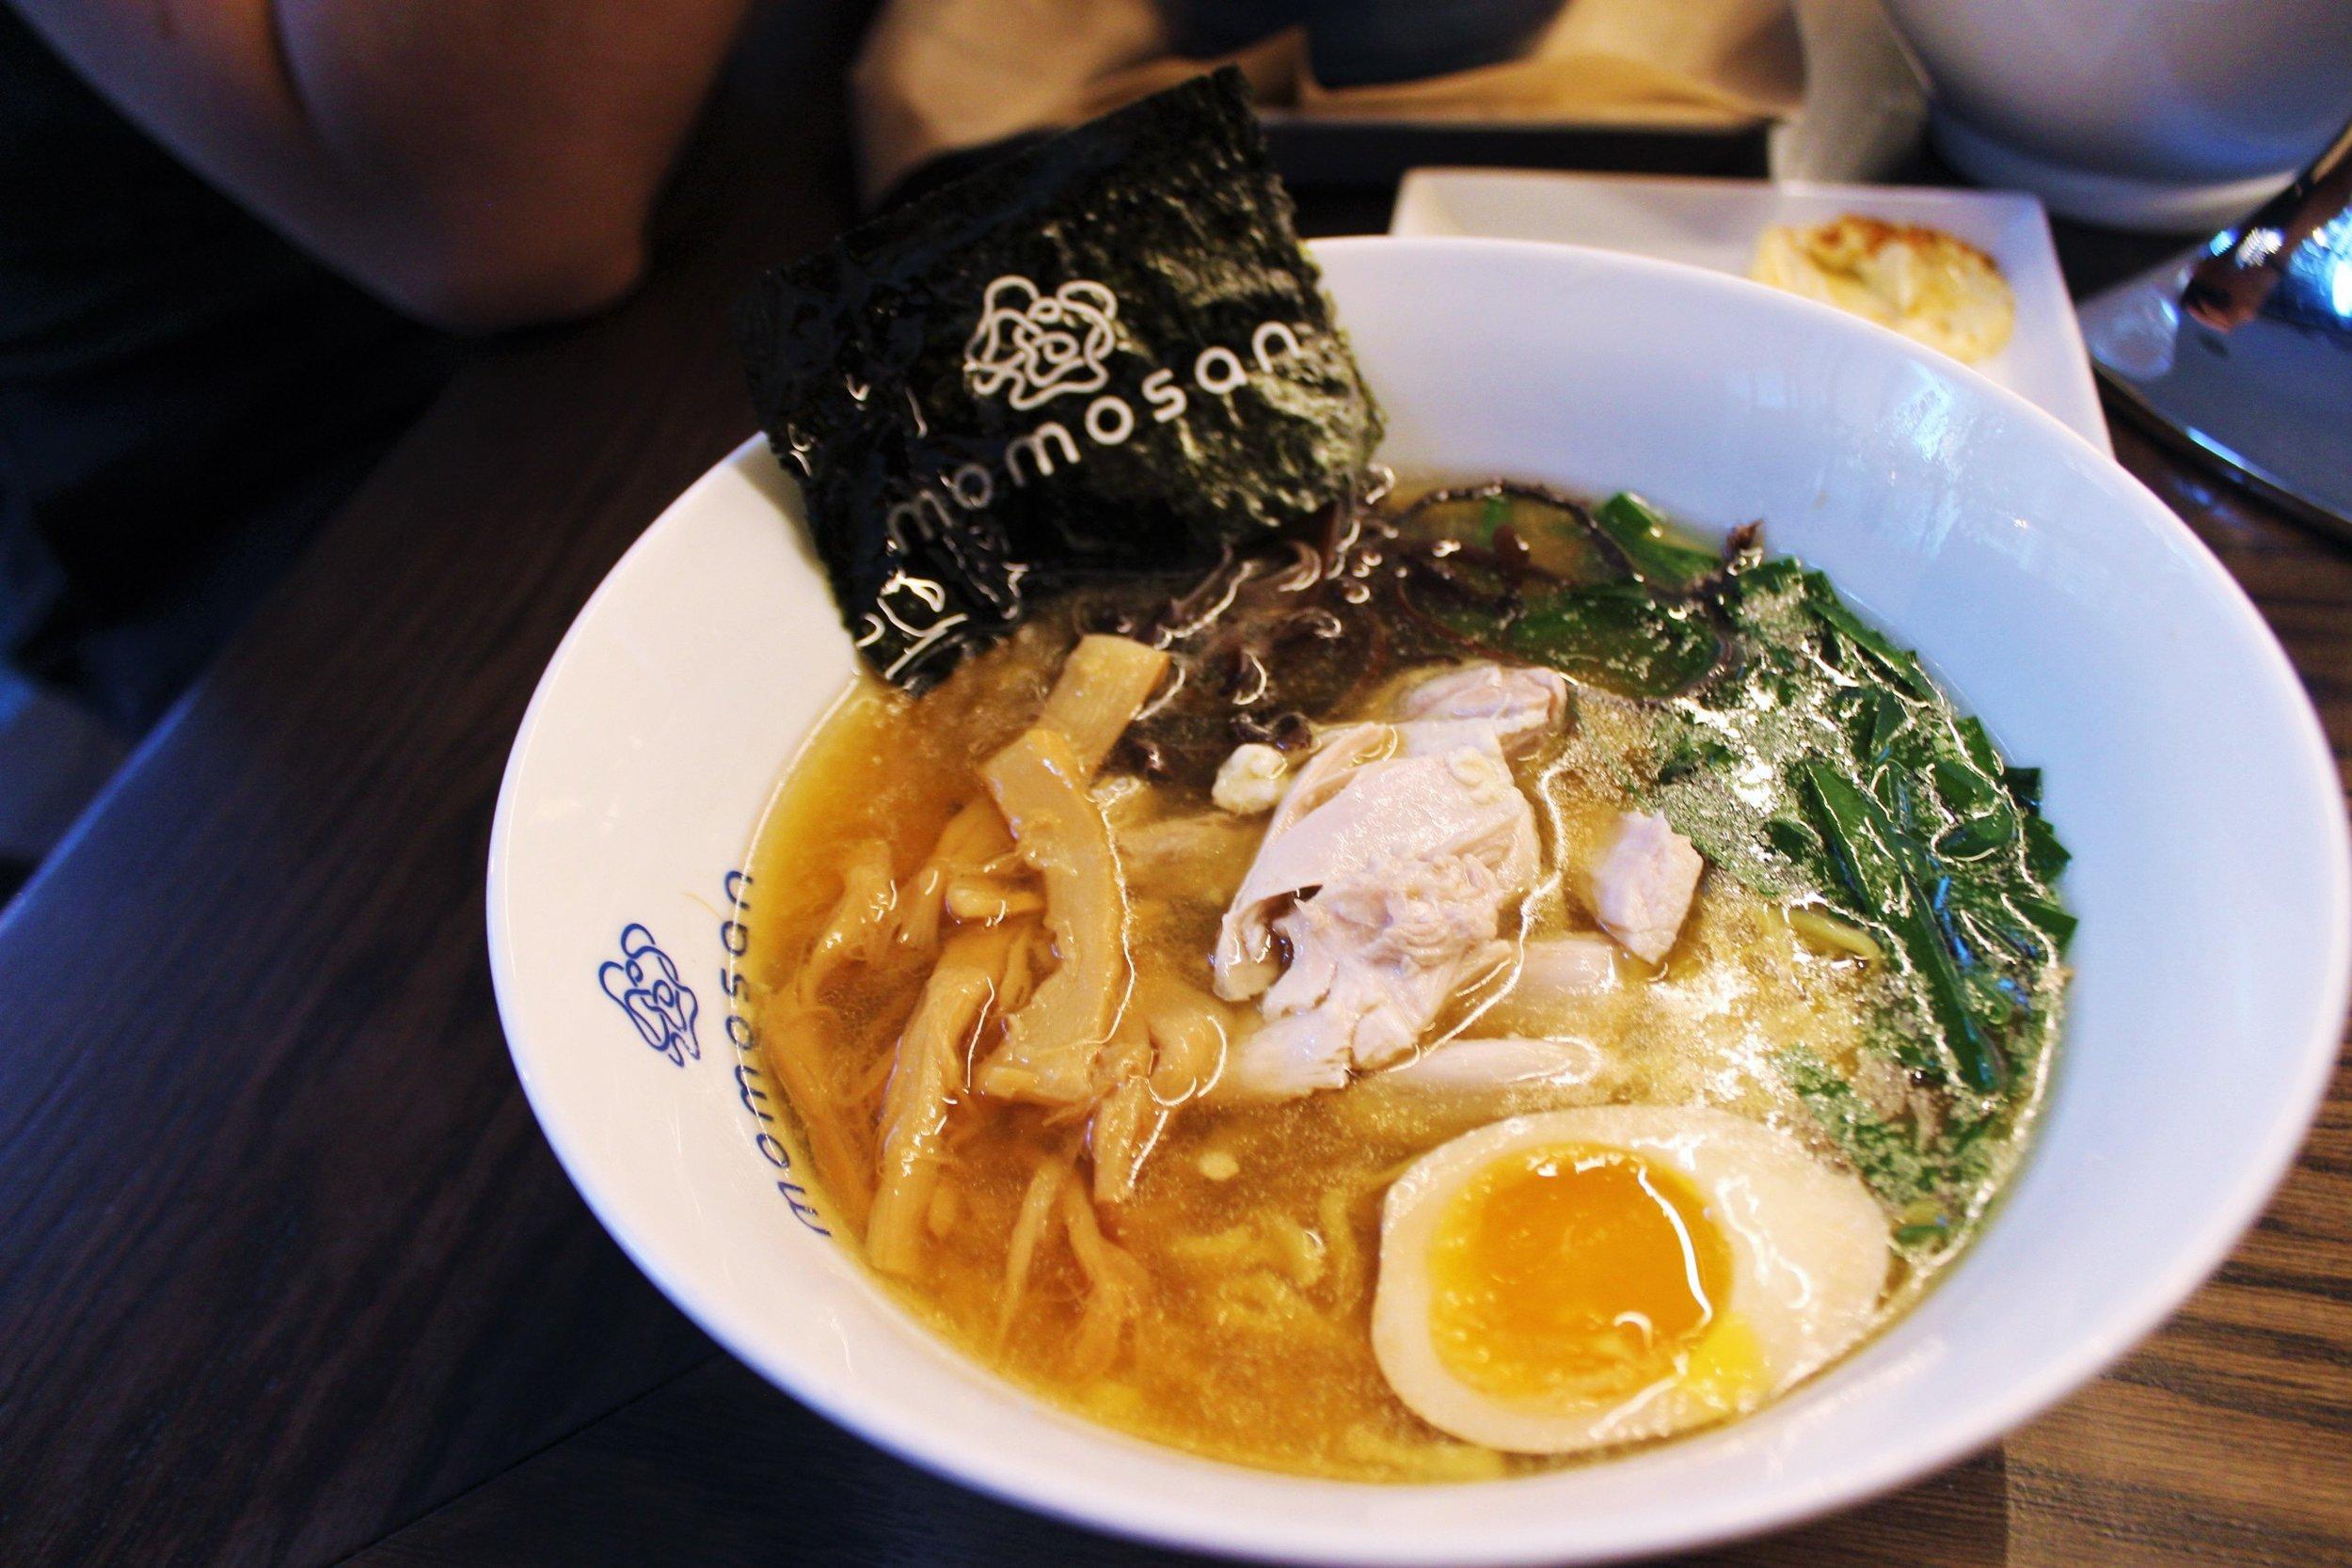 Tokyo Chicken: Steamed Chicken, Aji-Tama, Menma, Seared Garlic Chive, Kikurage, Toasted Nori, Soy Tare